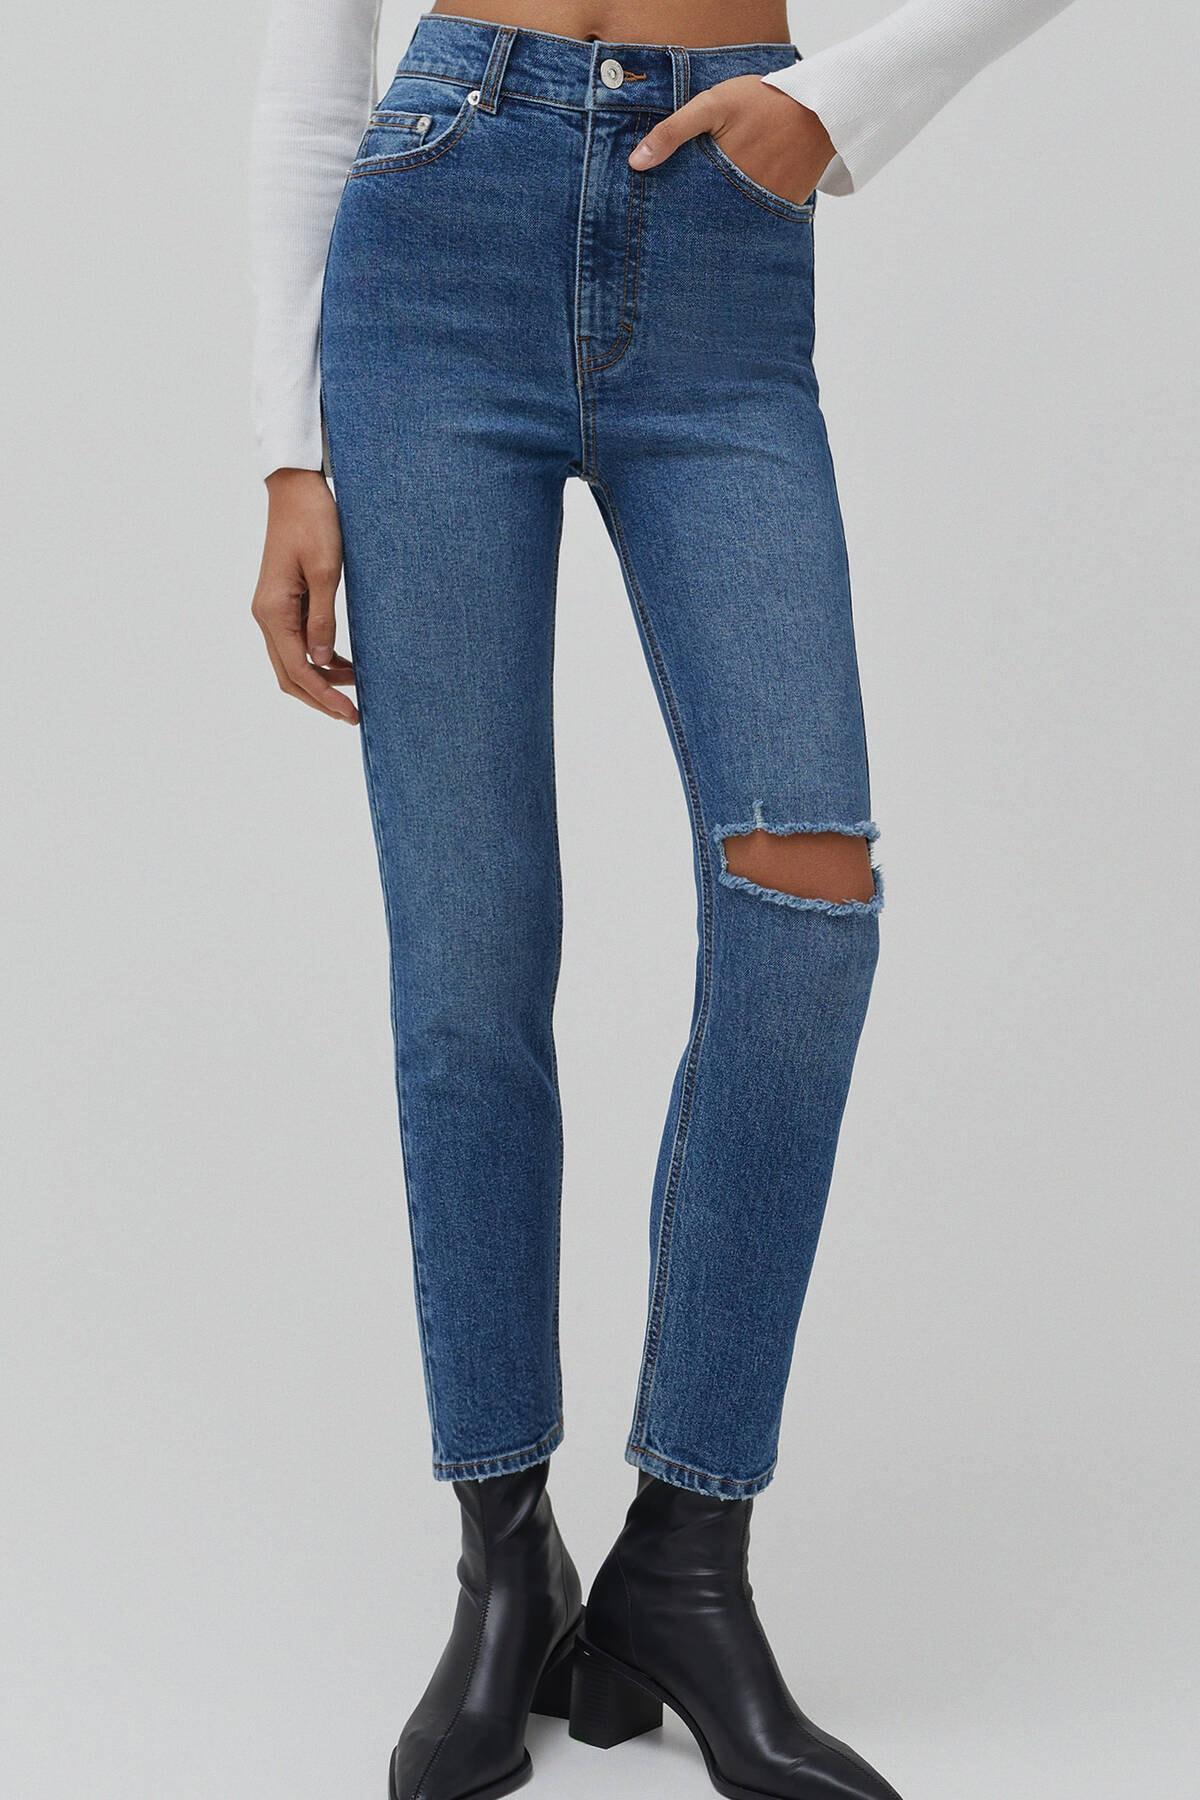 Pull & Bear Kadın Mavi Süper Yüksek Bel Slim Fit Mom Jean 04681315 3